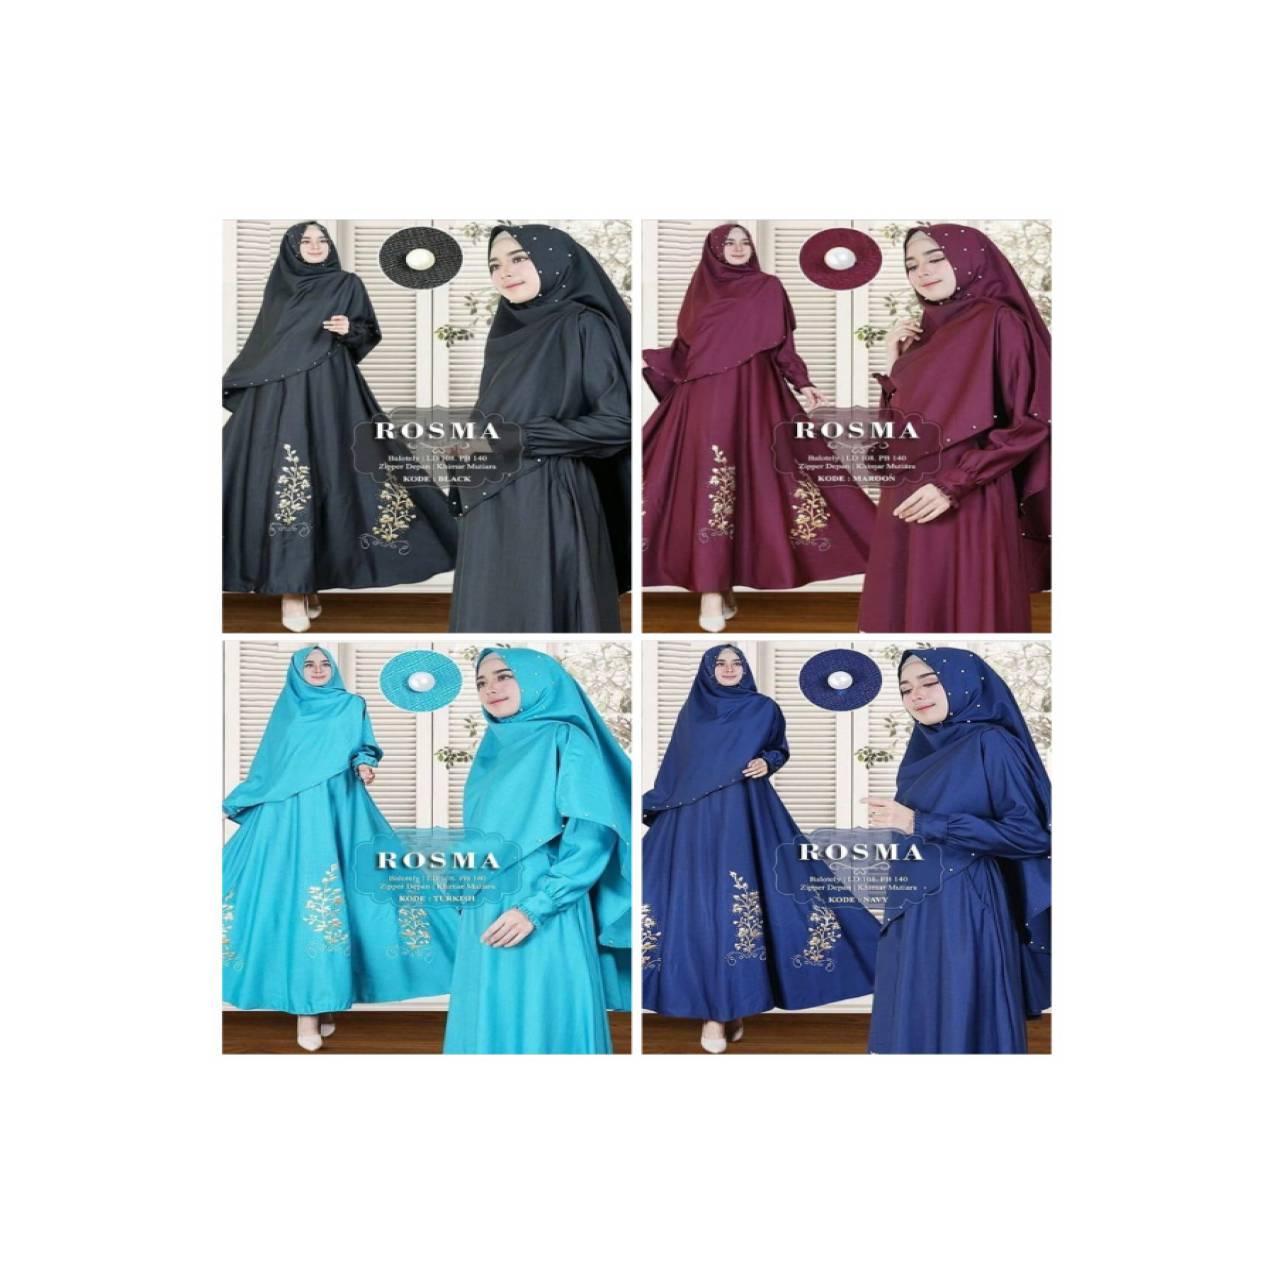 xxl xl jumbo bigsize gamis dress maxi baju muslim syari hijab pesta